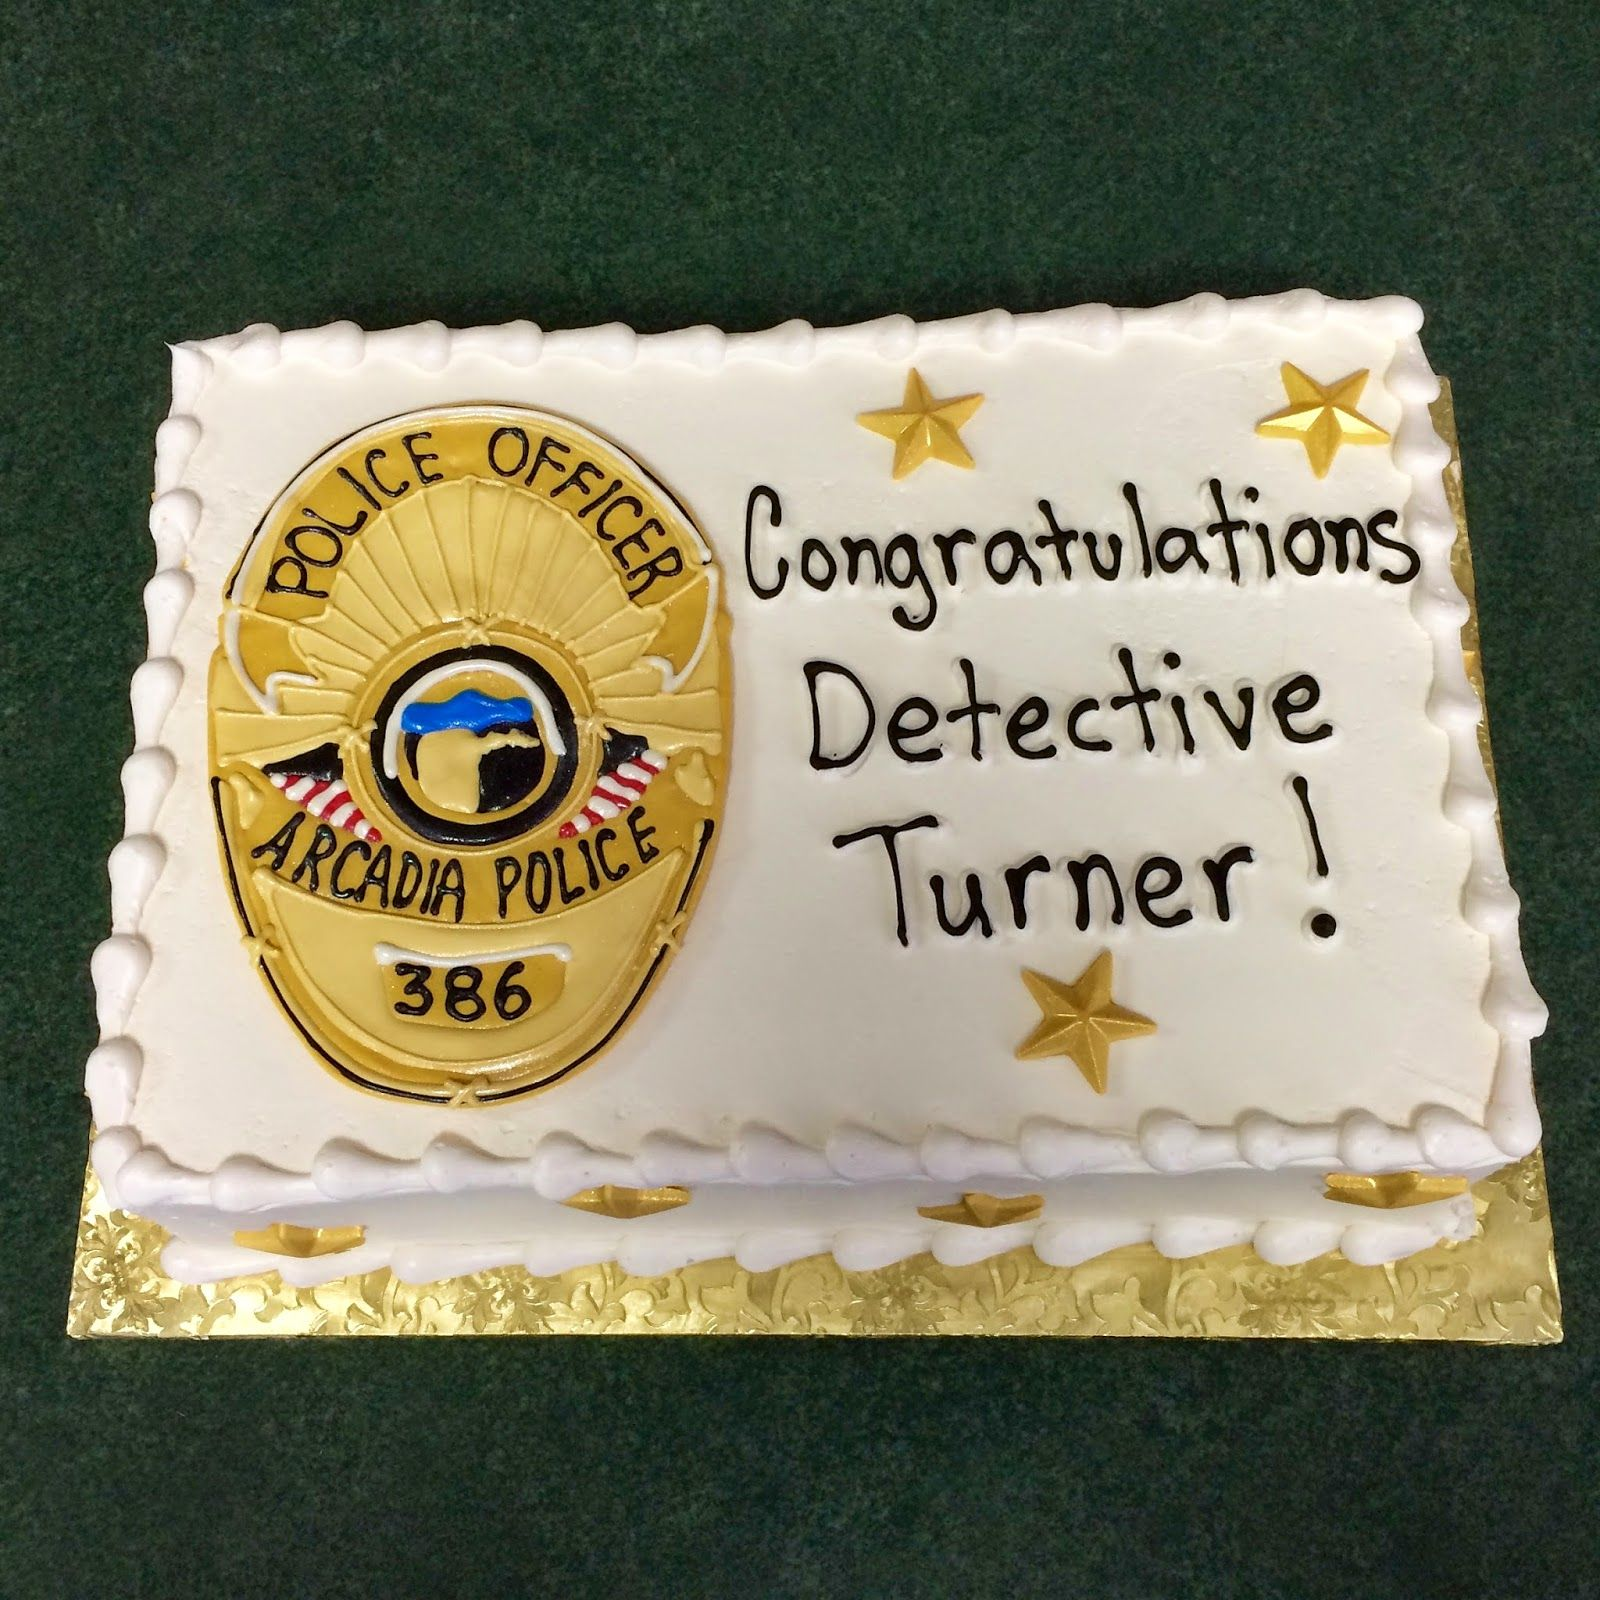 Arcadia Police Department News Information Blog Honoring Detective Steve Turner On His Retirement Detective Police Department Police